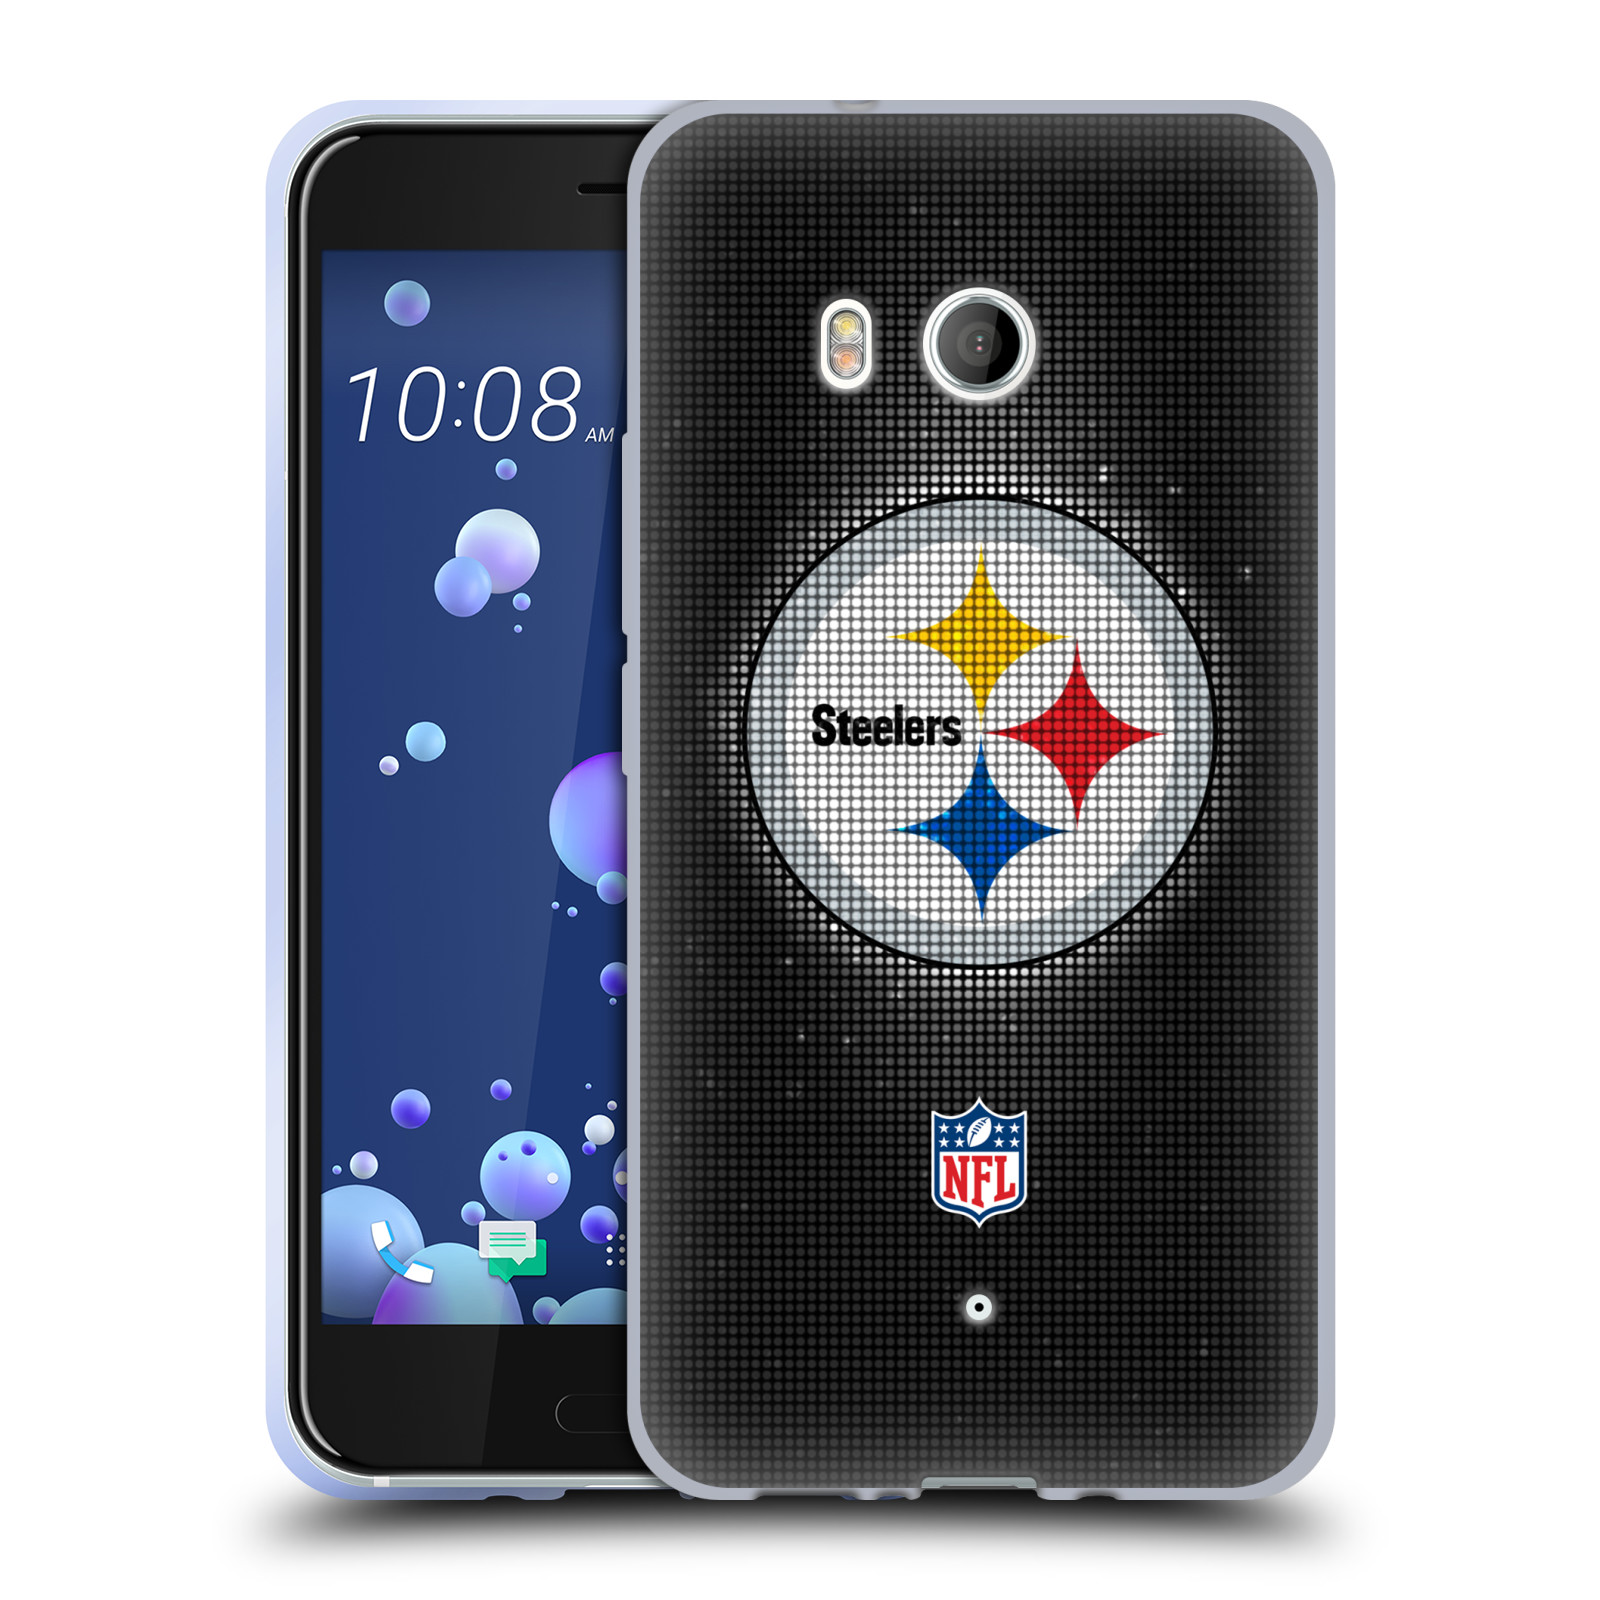 Oficial-de-la-NFL-2017-18-Pittsburgh-Steelers-caso-De-Gel-Suave-para-TELEFONOS-HTC-1